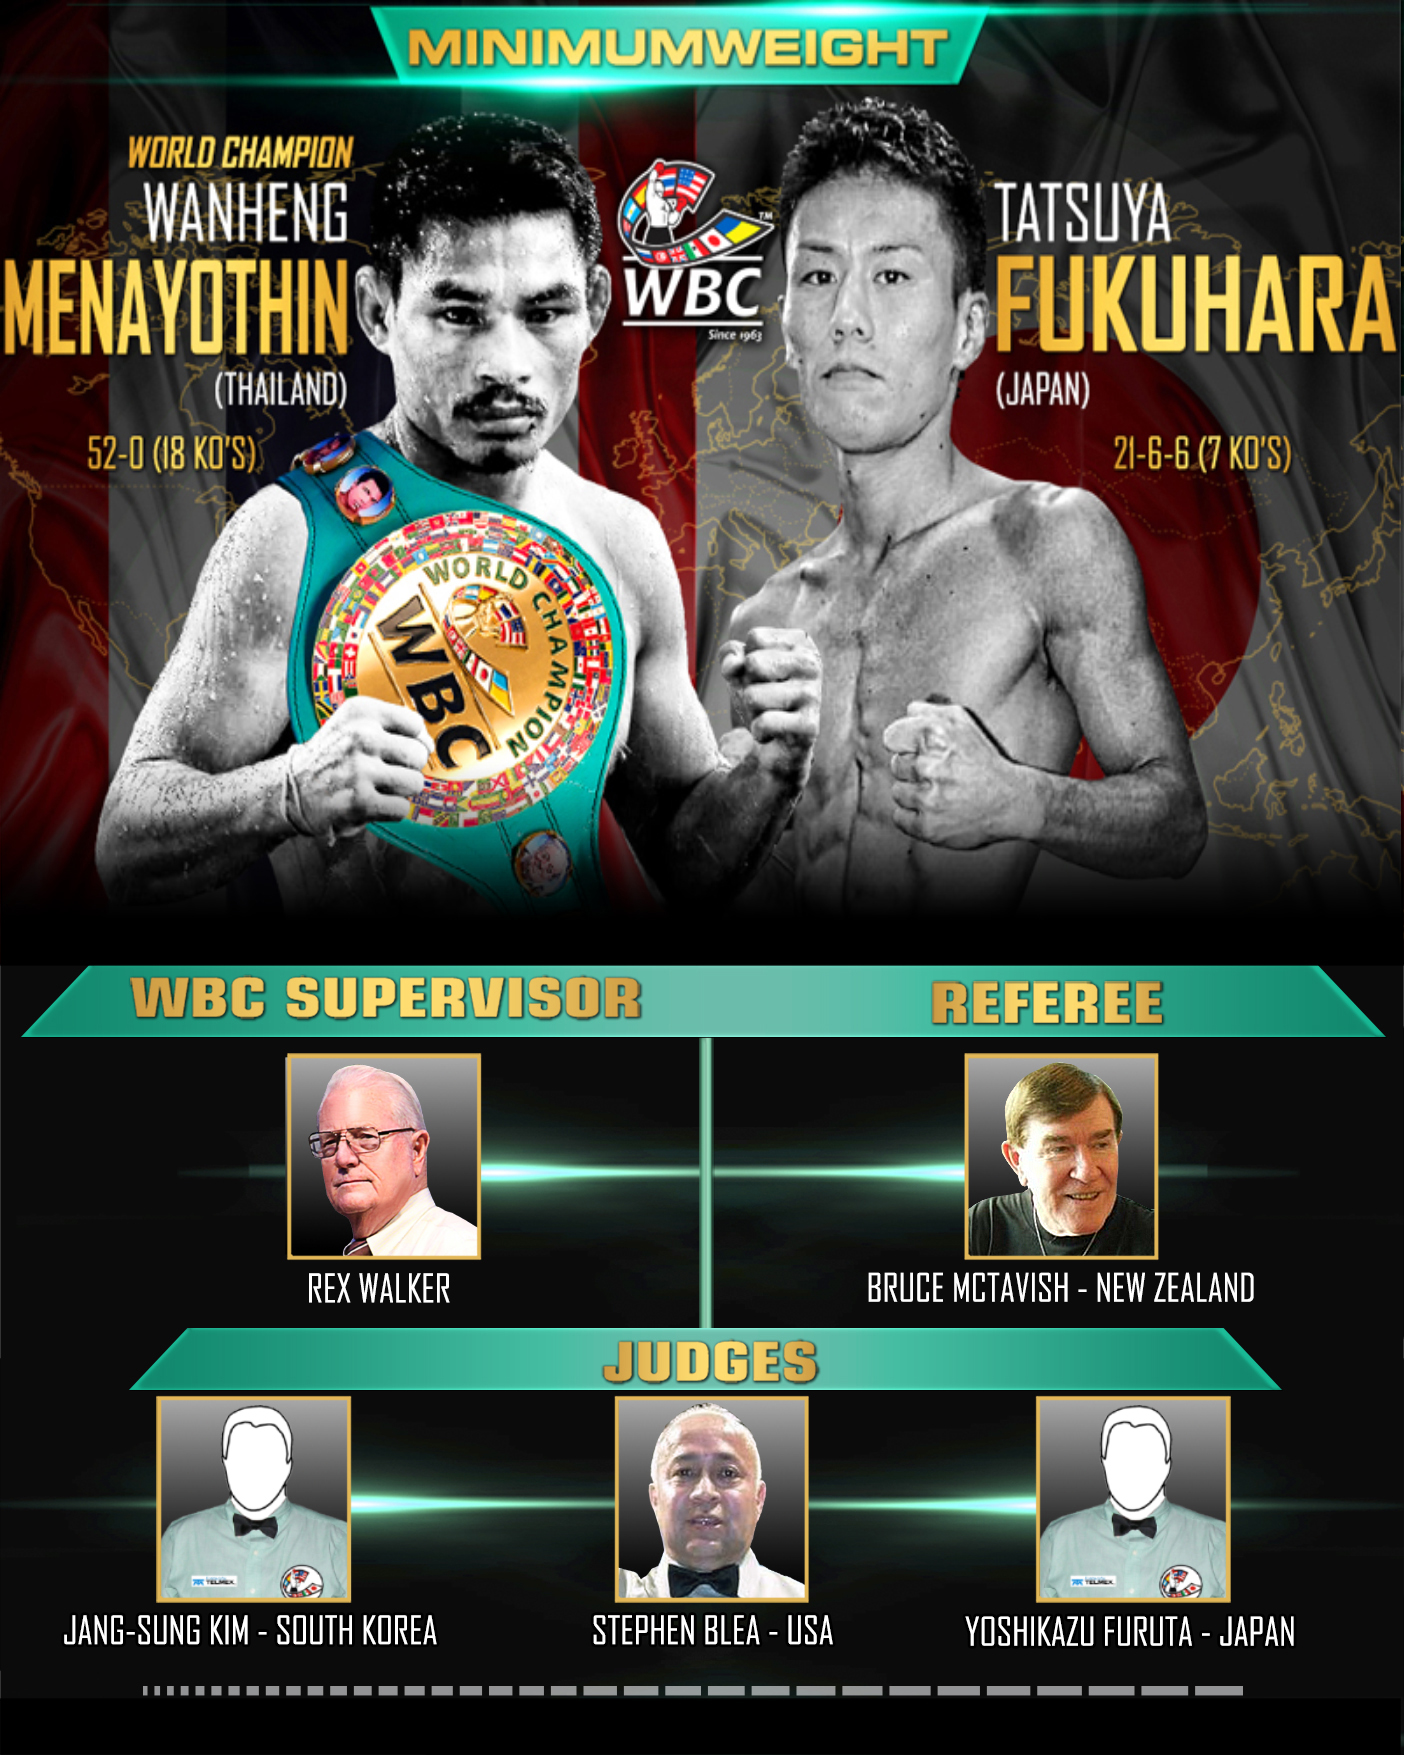 http://suljosblog.com/suljos/wp-content/uploads/2019/05/menayothin-vs-fukuhara-may2019-1.jpg